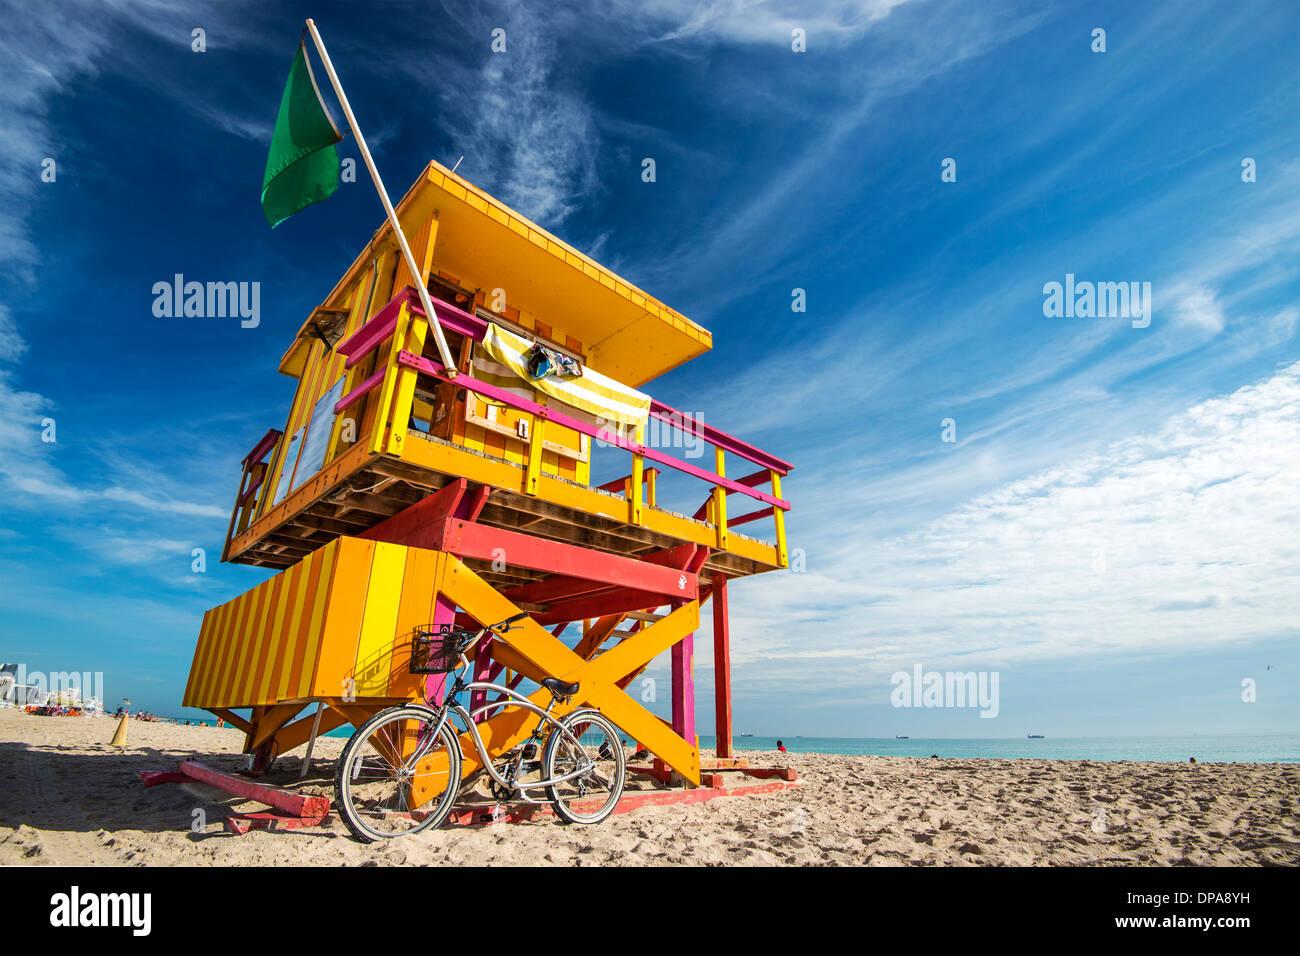 South Beach, Miami, Florida, Stati Uniti d'America lifeguard post. Immagini Stock